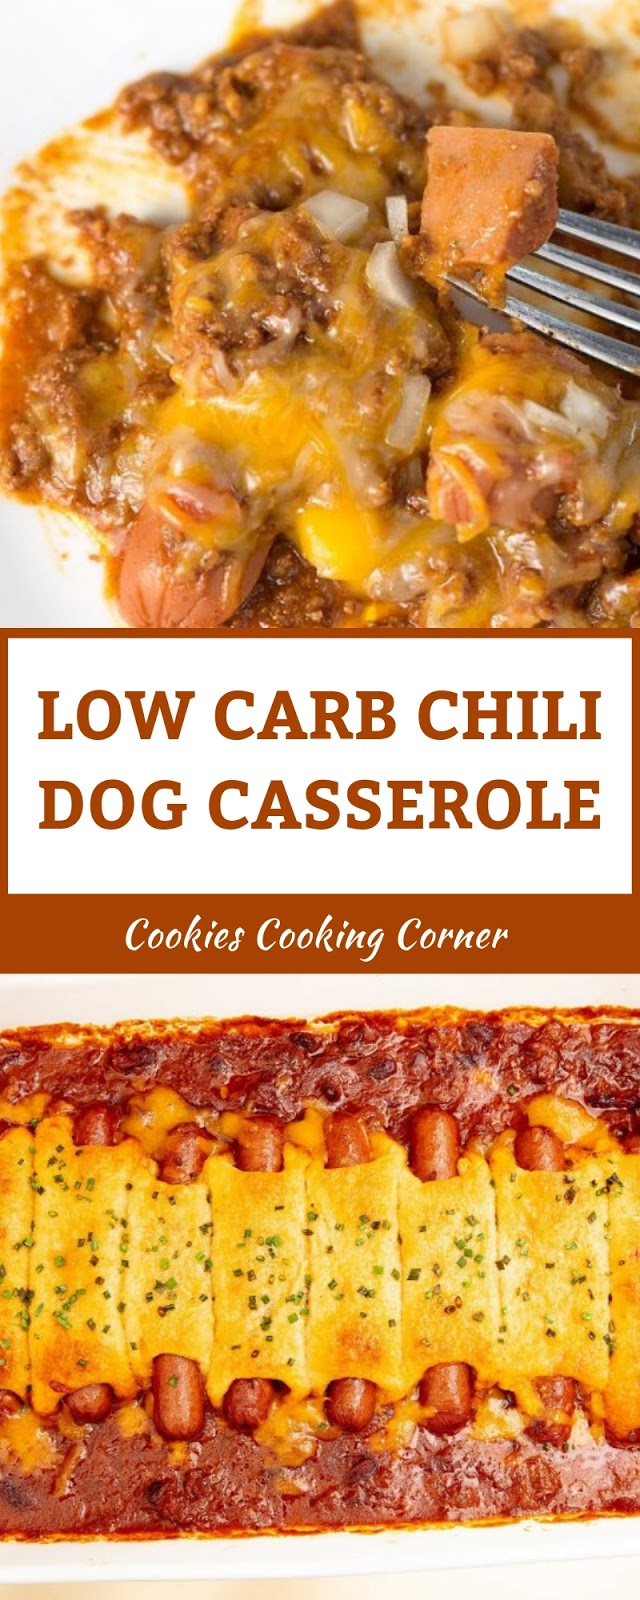 LOW CARB CHILI DOG CASSEROLE